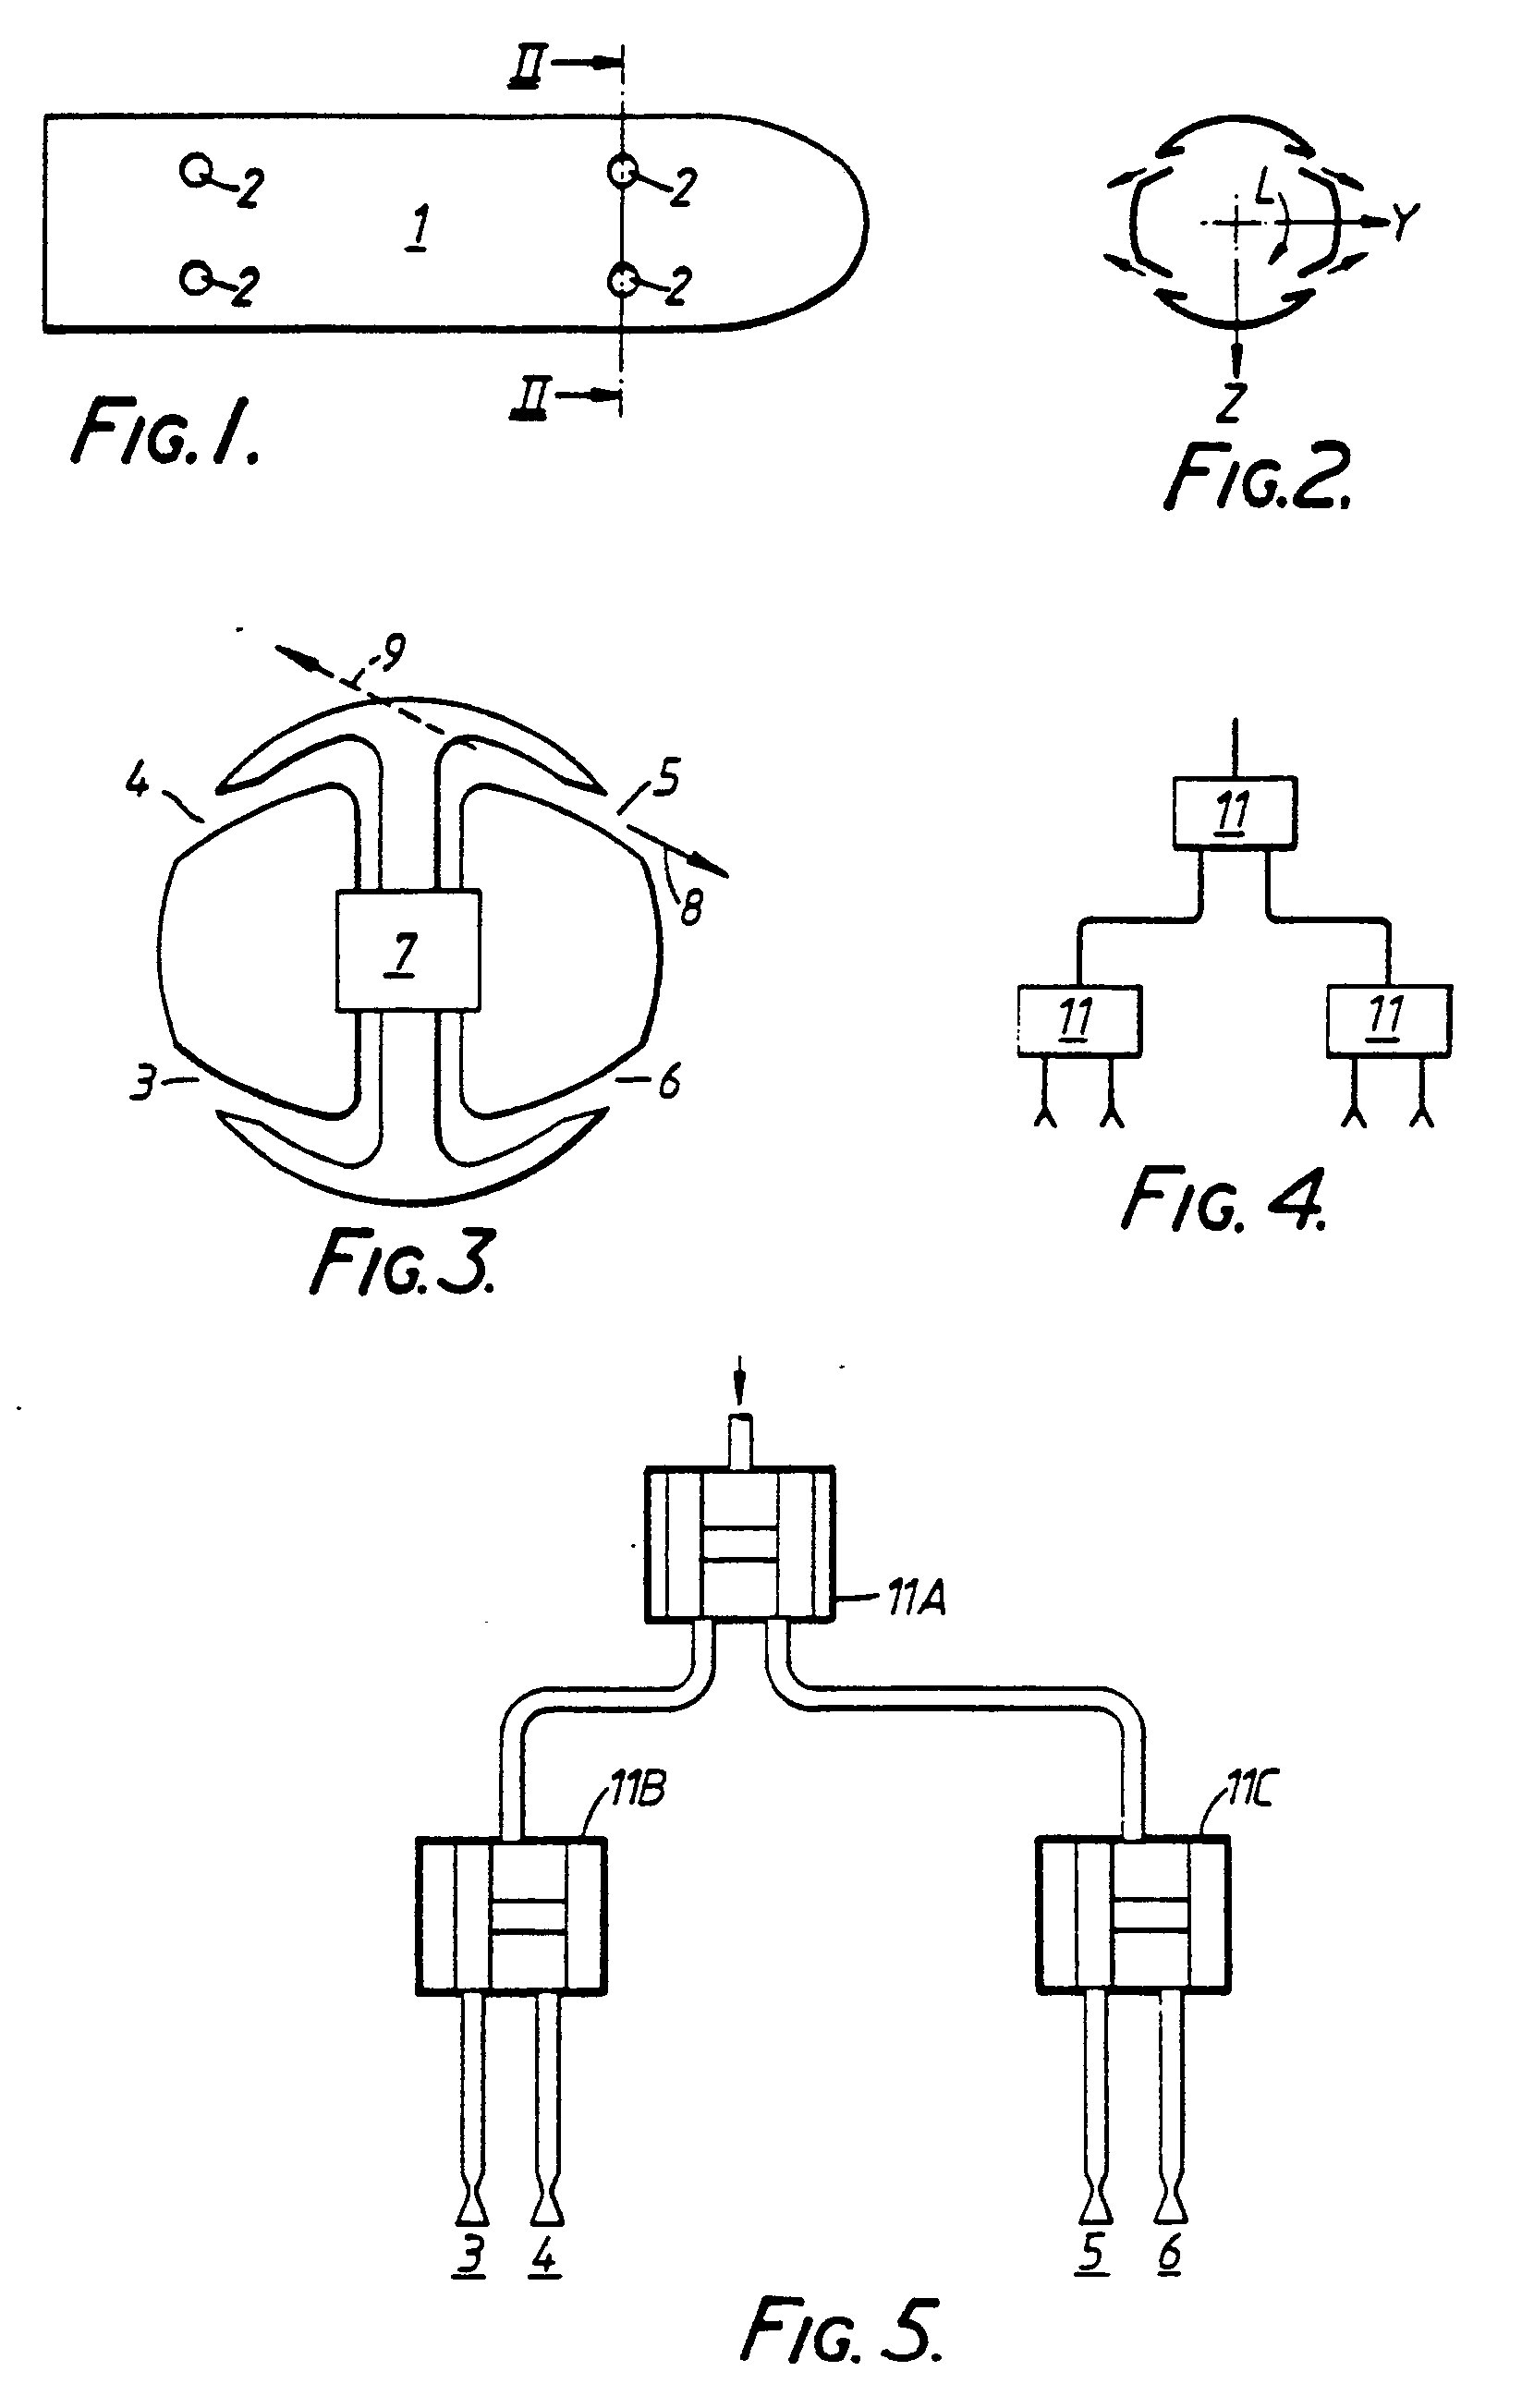 4 Way 2 Position Air Valve Schematic, 4, Free Engine Image